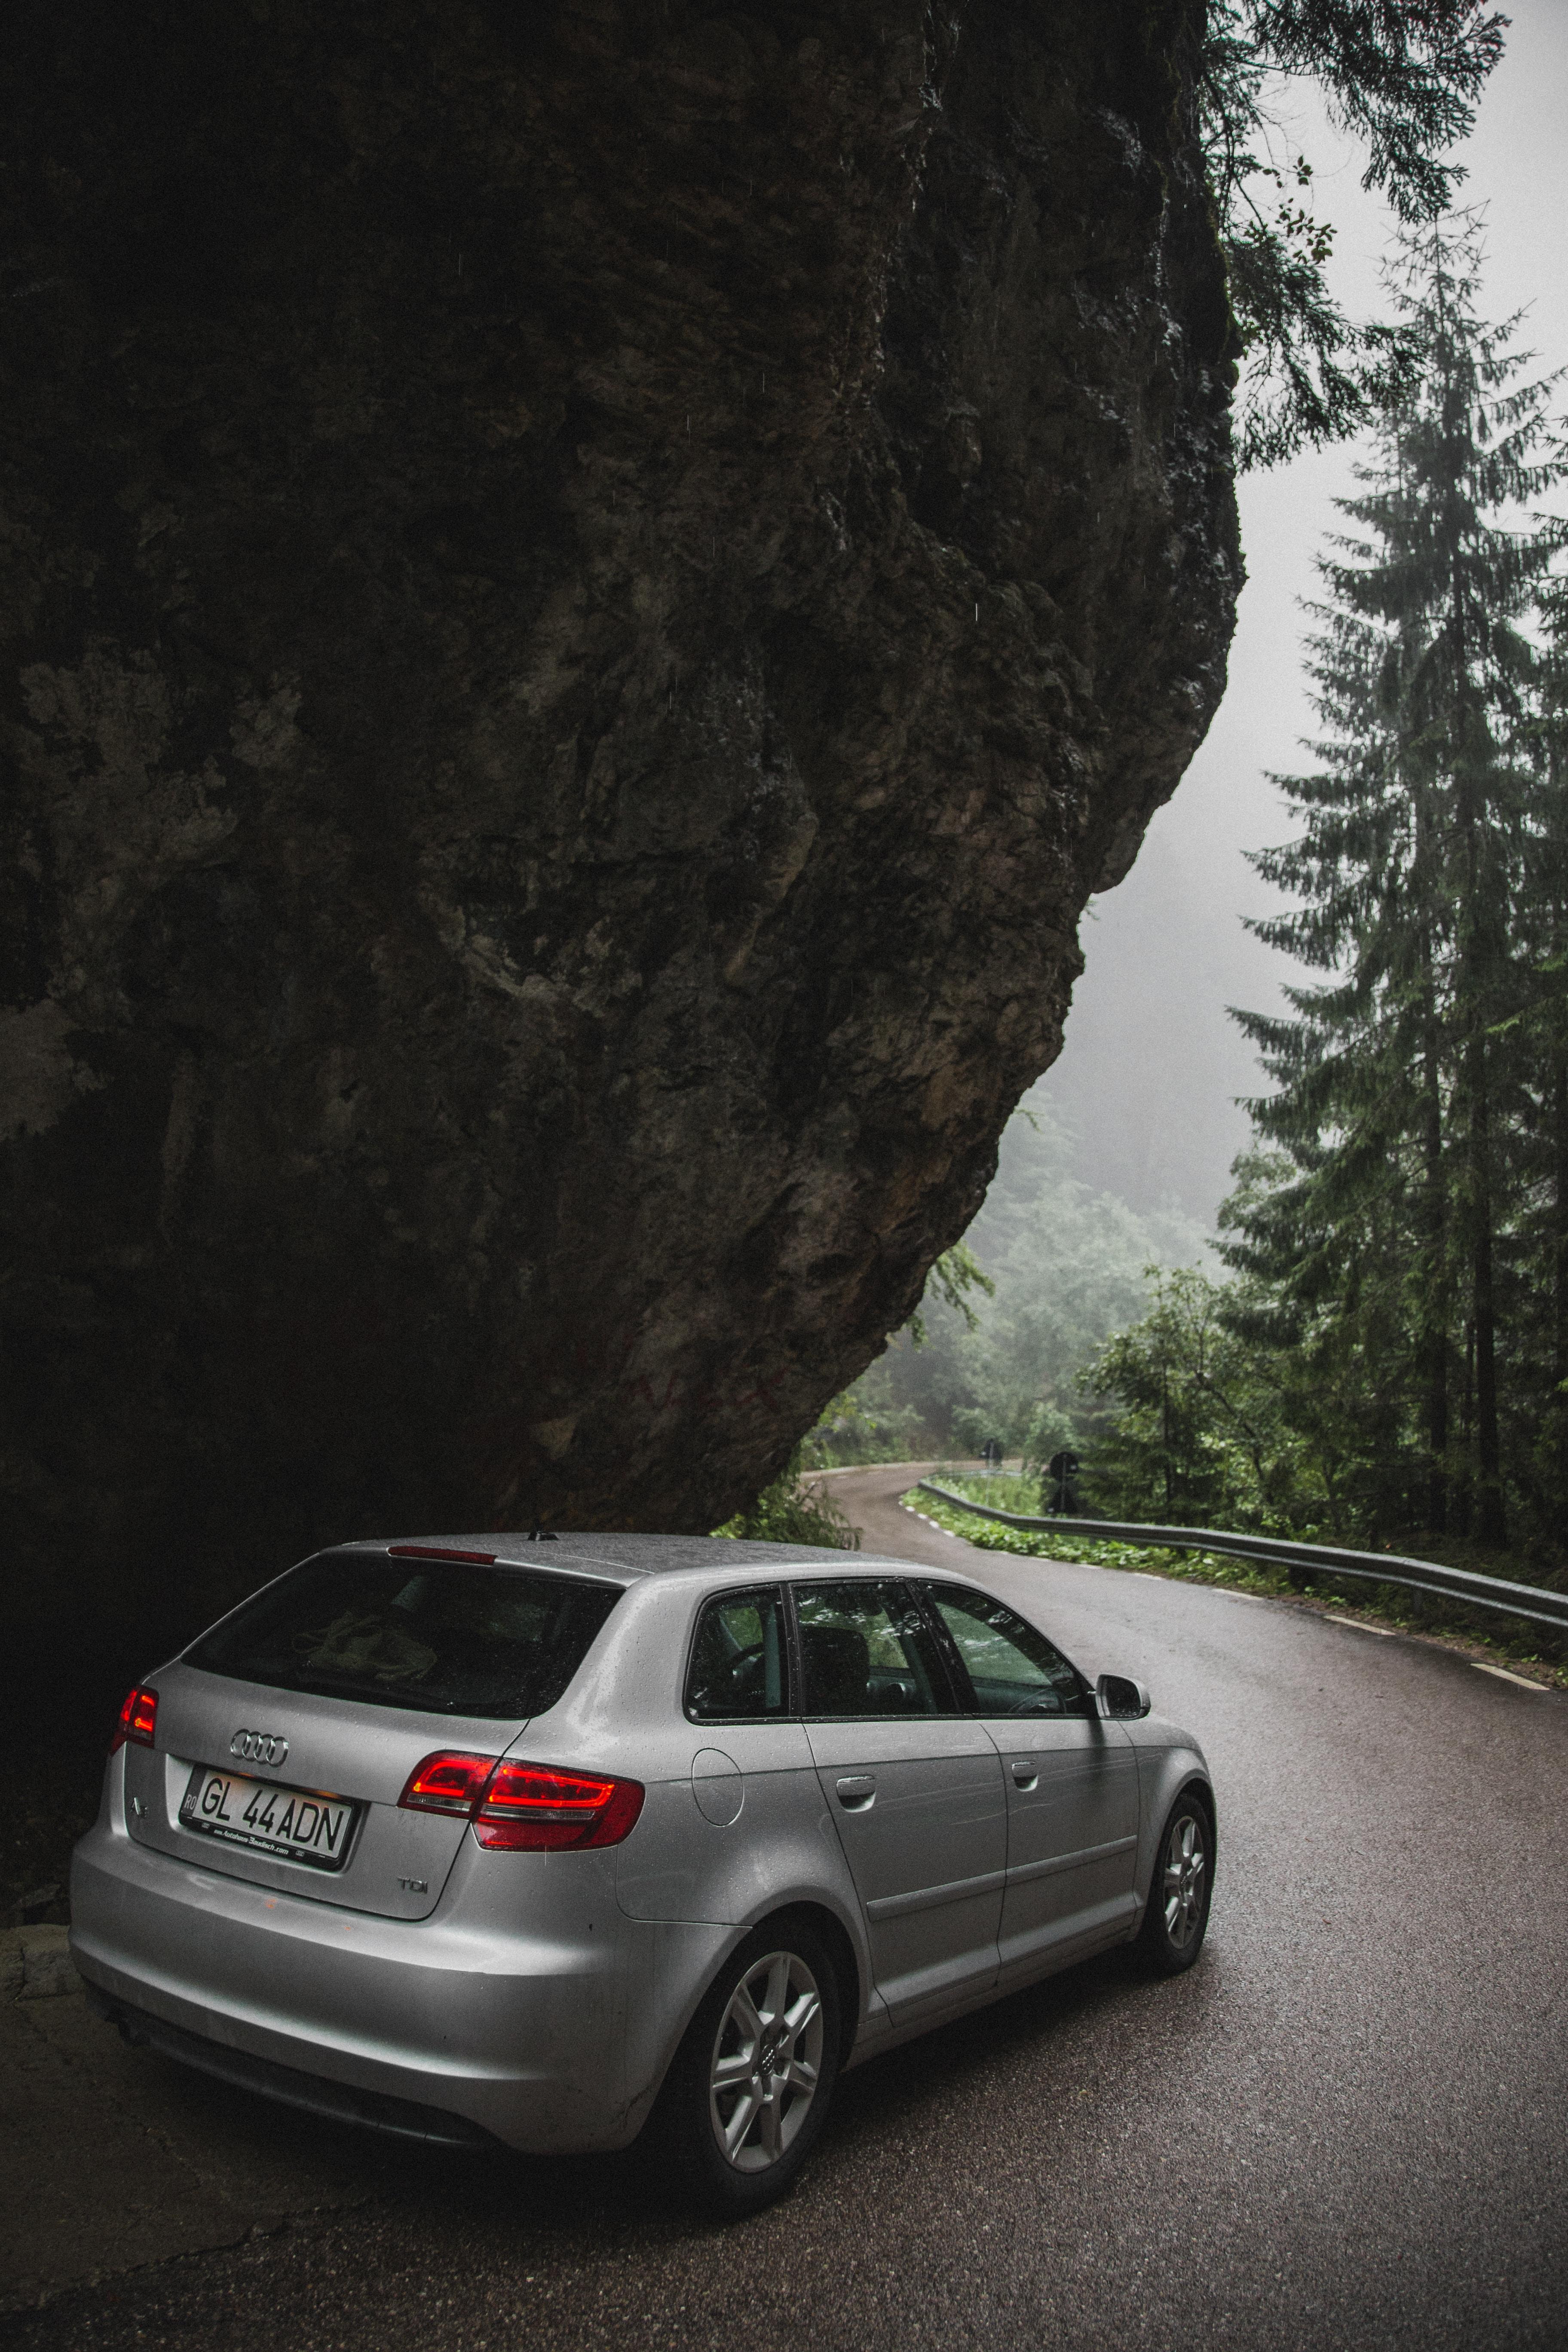 gray Audi 5-door hatchback passing on black rock formation